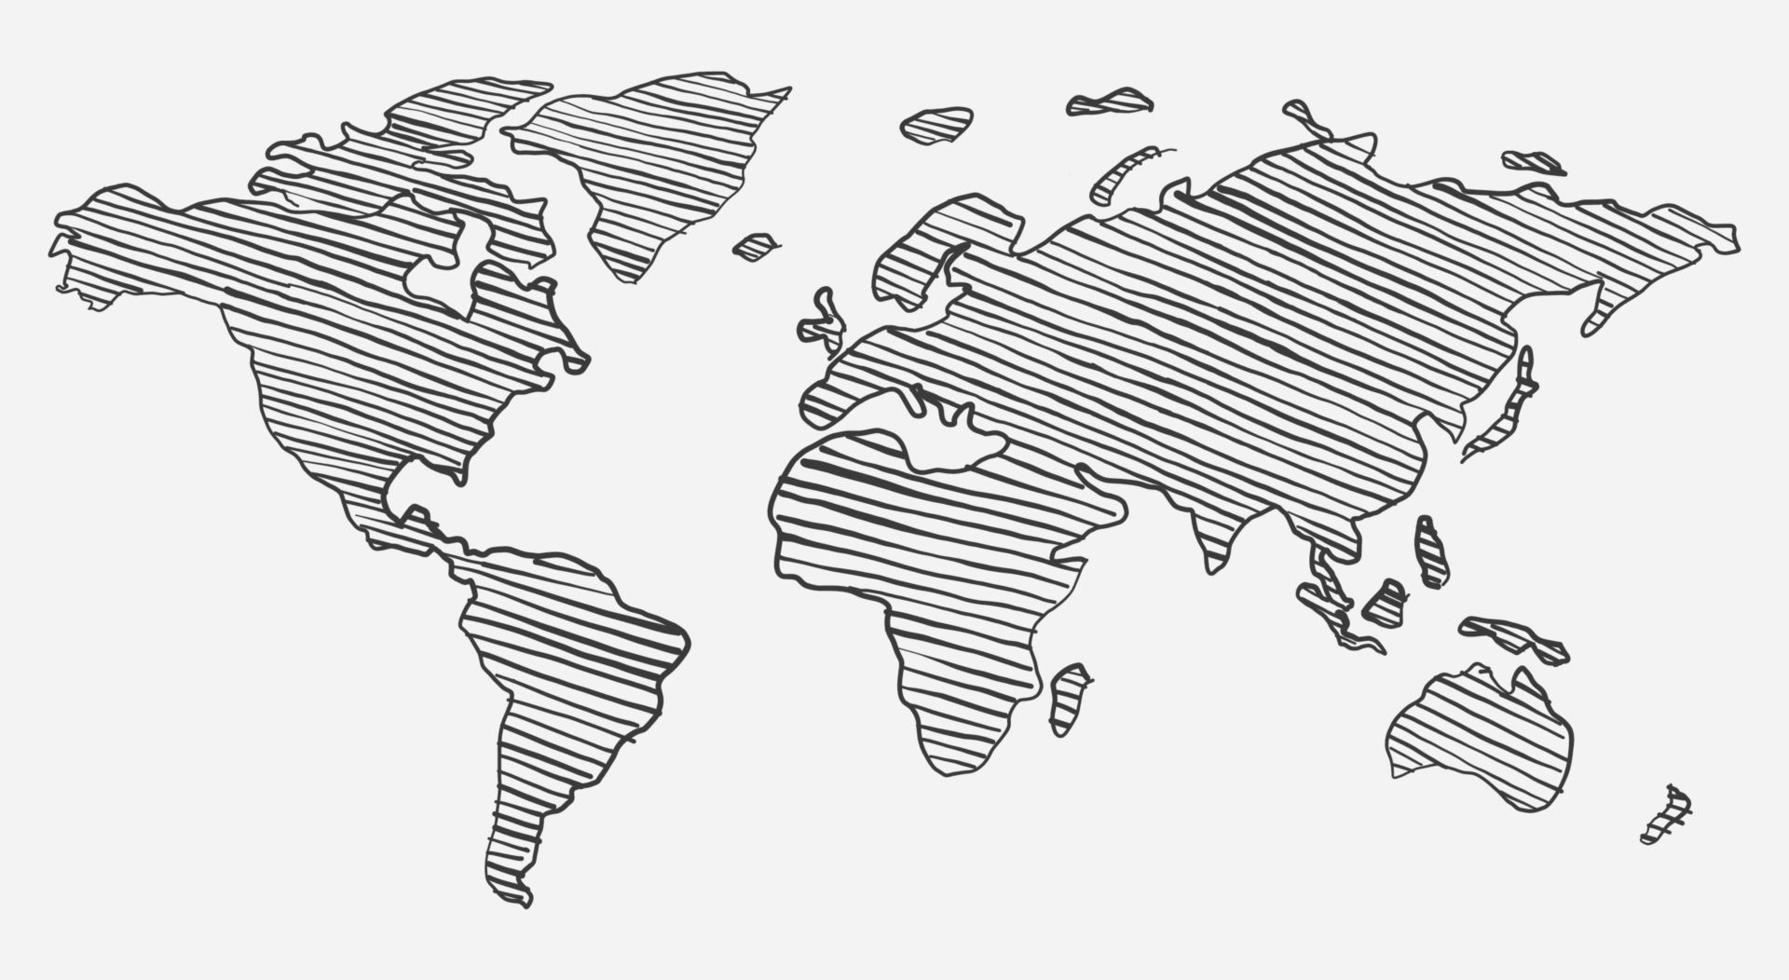 rabiscar esboço do mapa mundial vetor